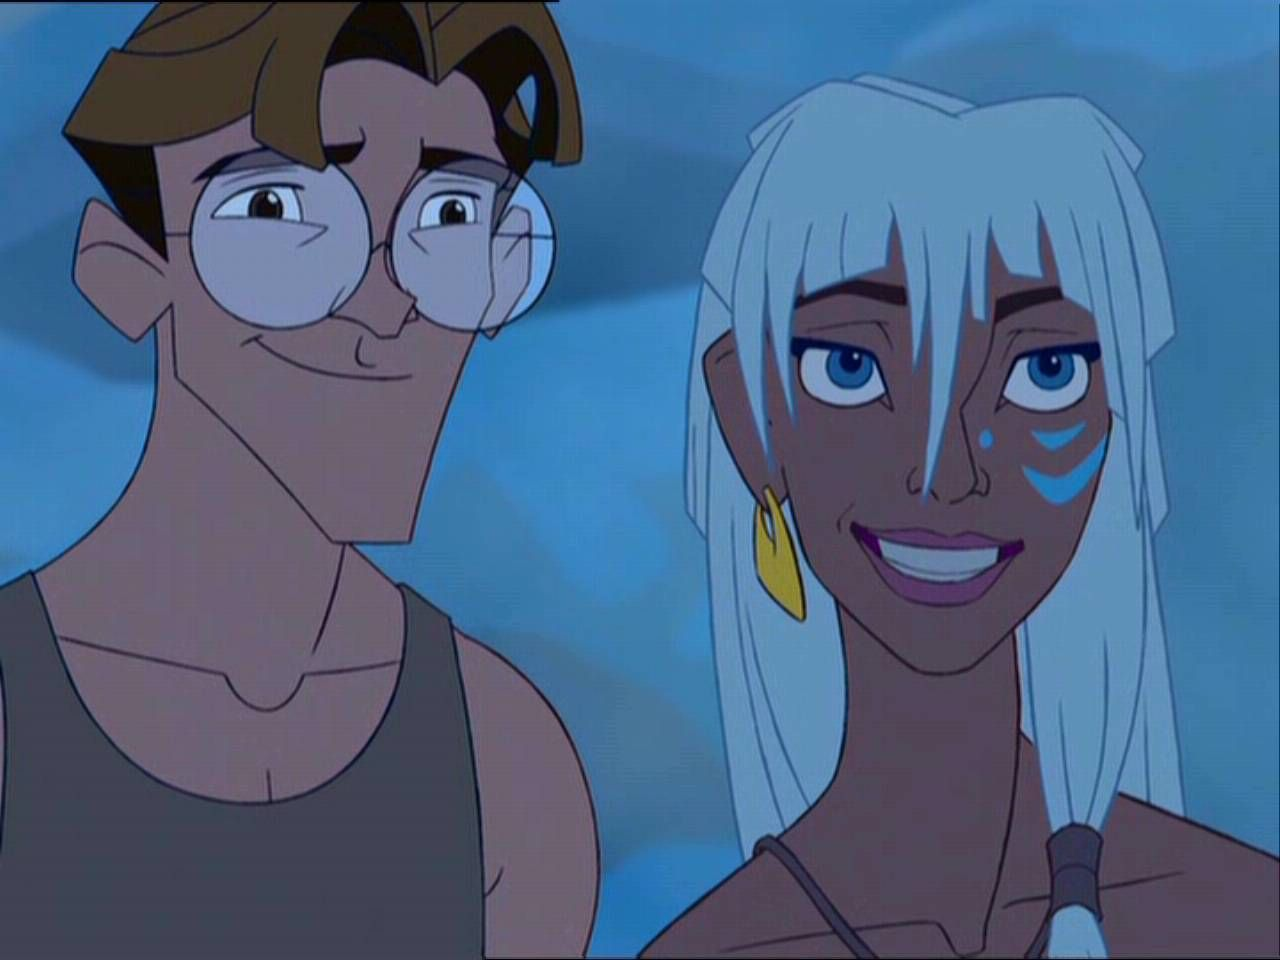 Pin By Lana On Princess Kidagakash Cosplay Disney Films Atlantis The Lost Empire Cartoon